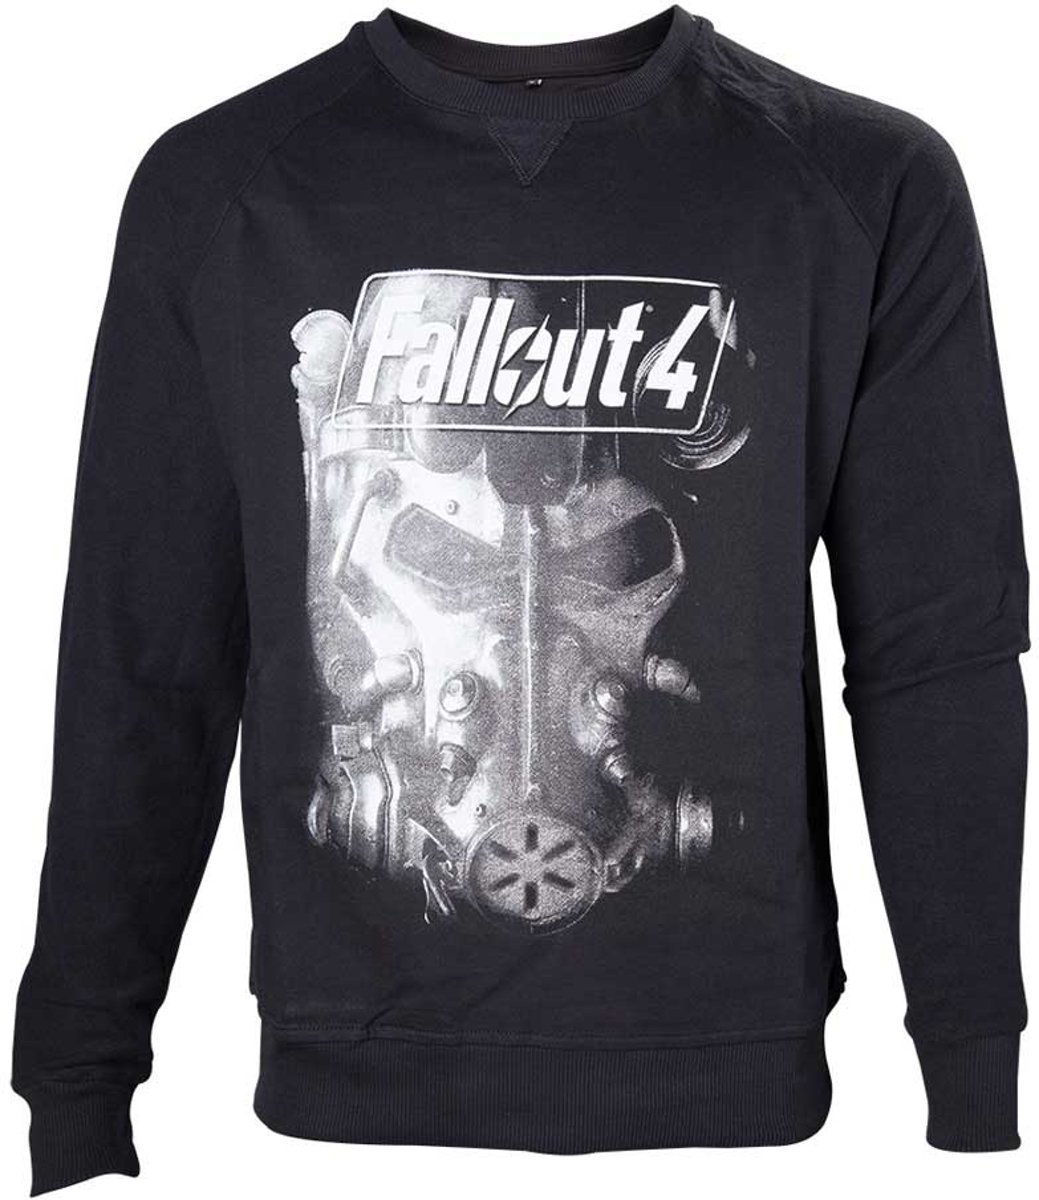 Fallout 4 - Black Sweater